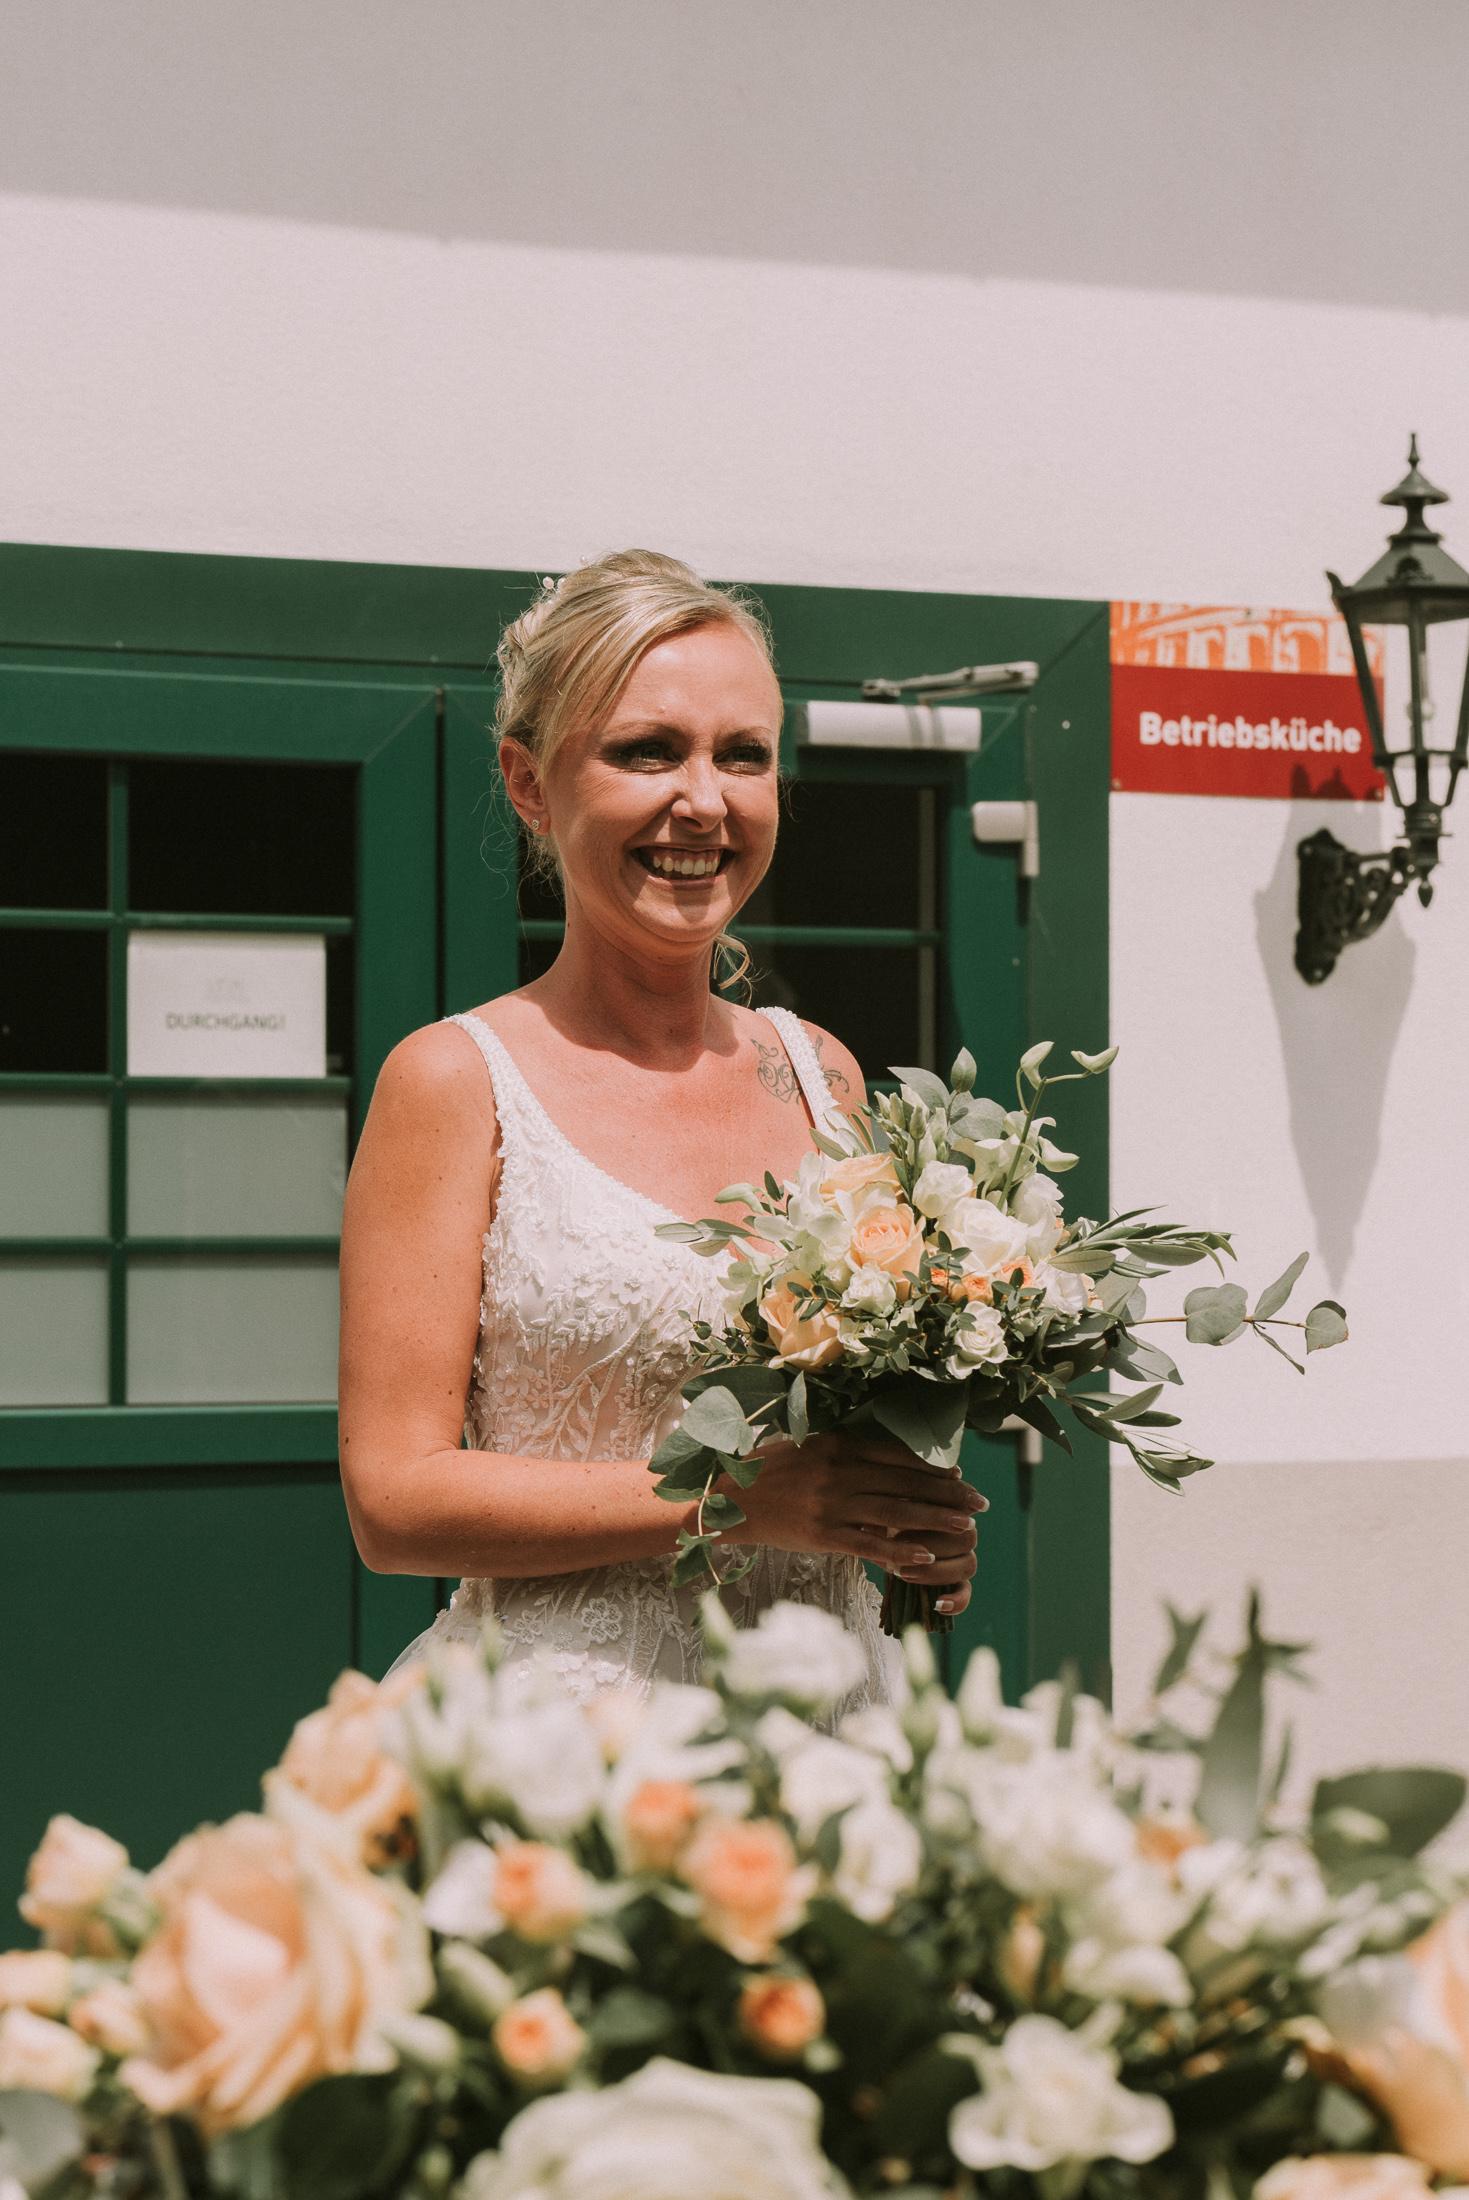 SebastianDon-Hochzeitsfotograf-Wien Umgebung-7.jpg